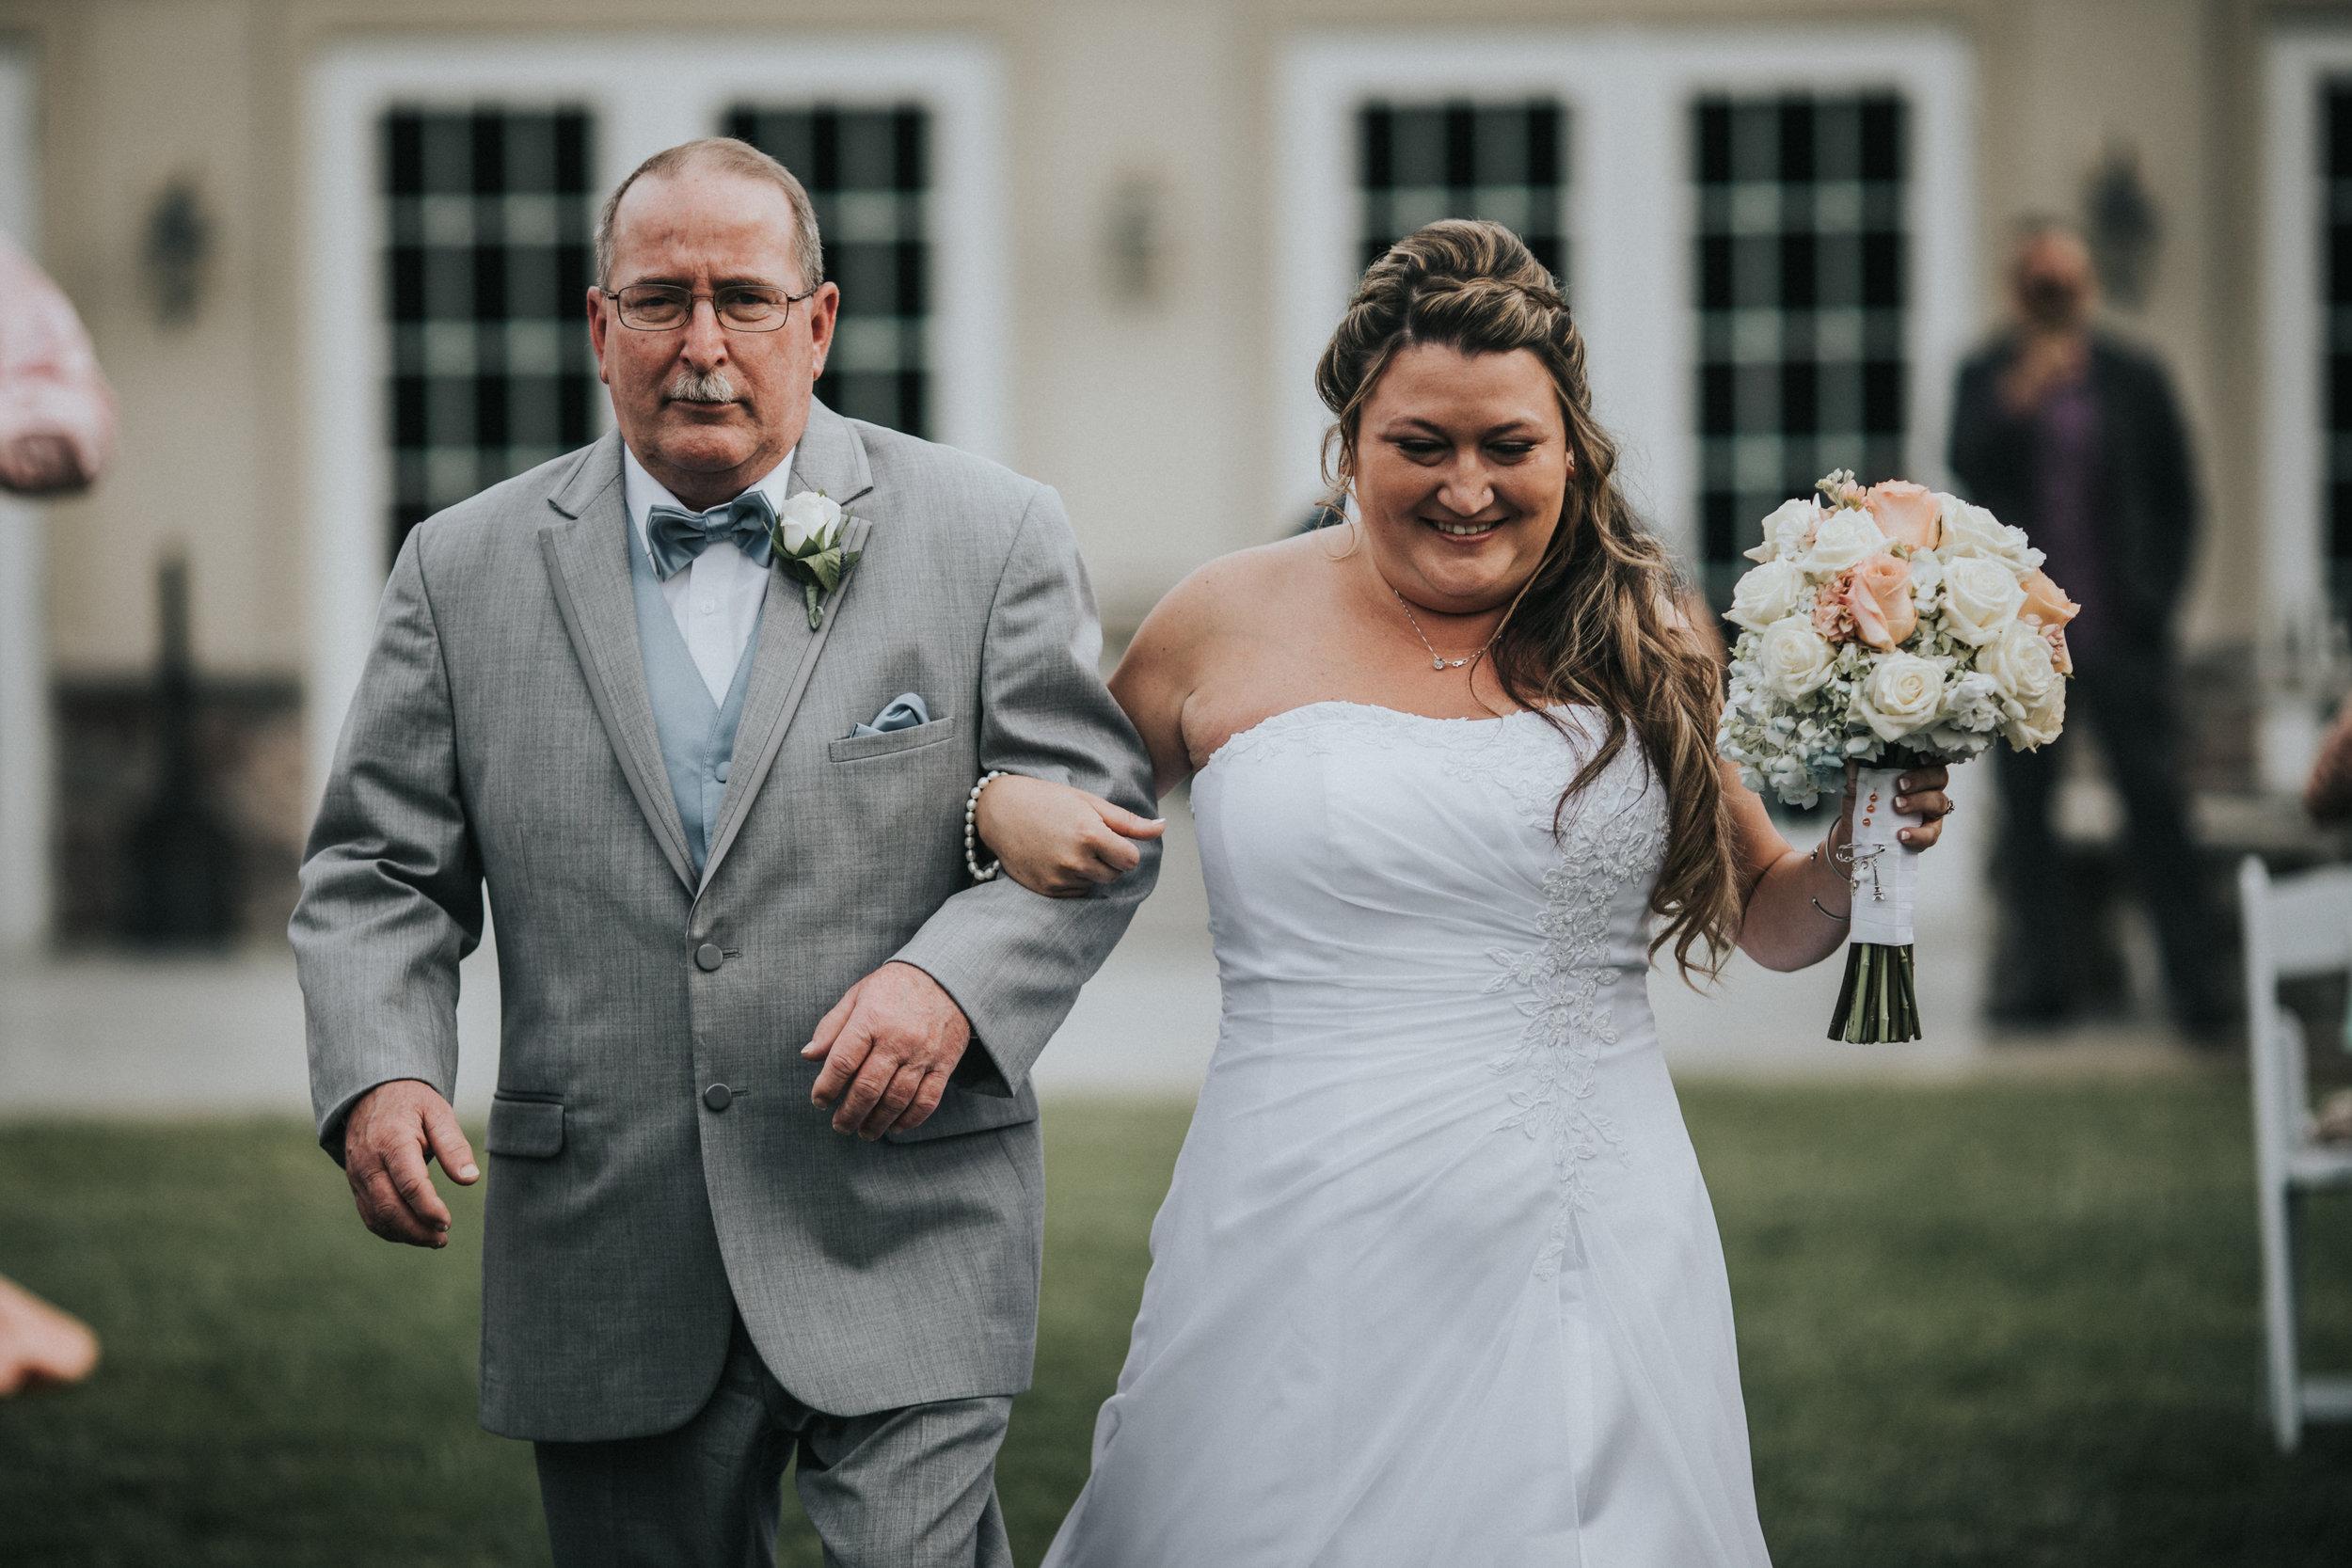 New-Jersey-Wedding-Photographer-JennaLynnPhotography-ValenzanoWinery-Ceremony-35.jpg